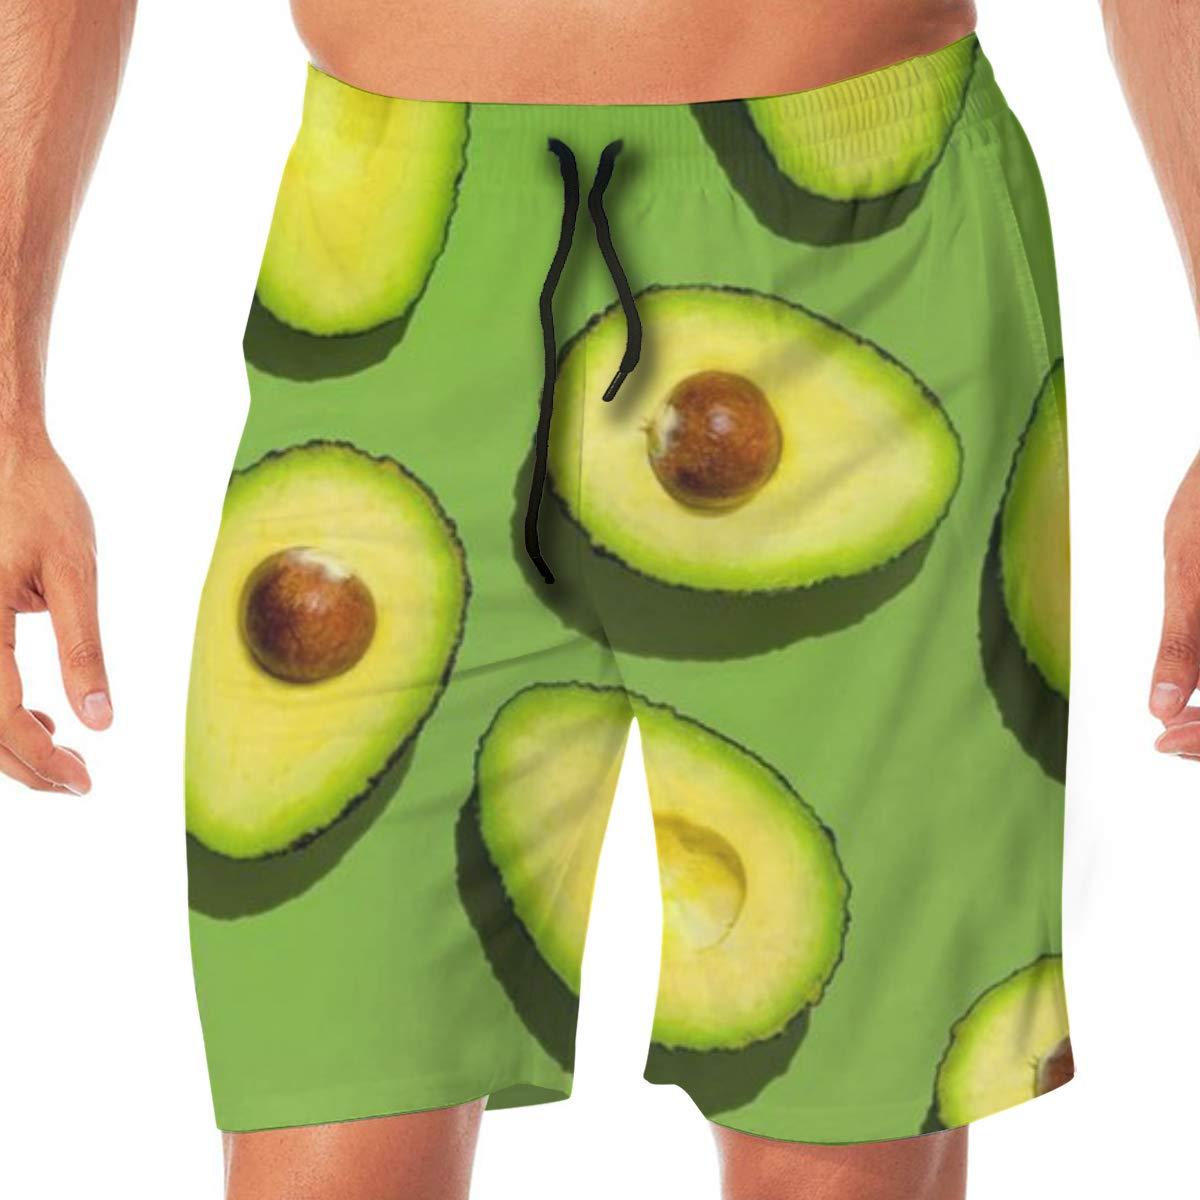 WOJUEDE Green Avocado Mens Swim Trunks Quick Dry Beach Wear Drawstring Board Shorts